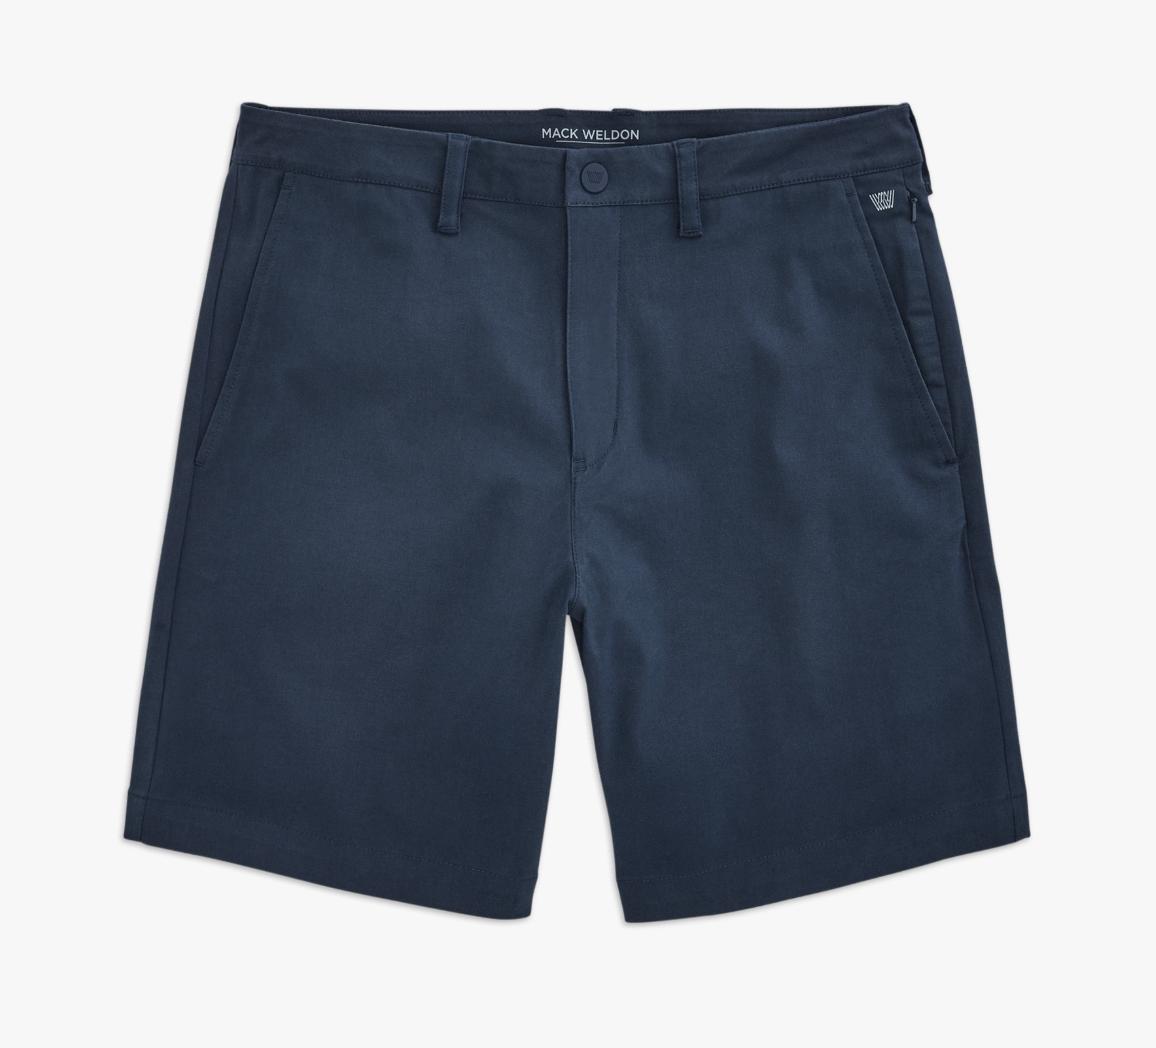 Mack Weldon Maverick Tech Chino Short, best mens shorts